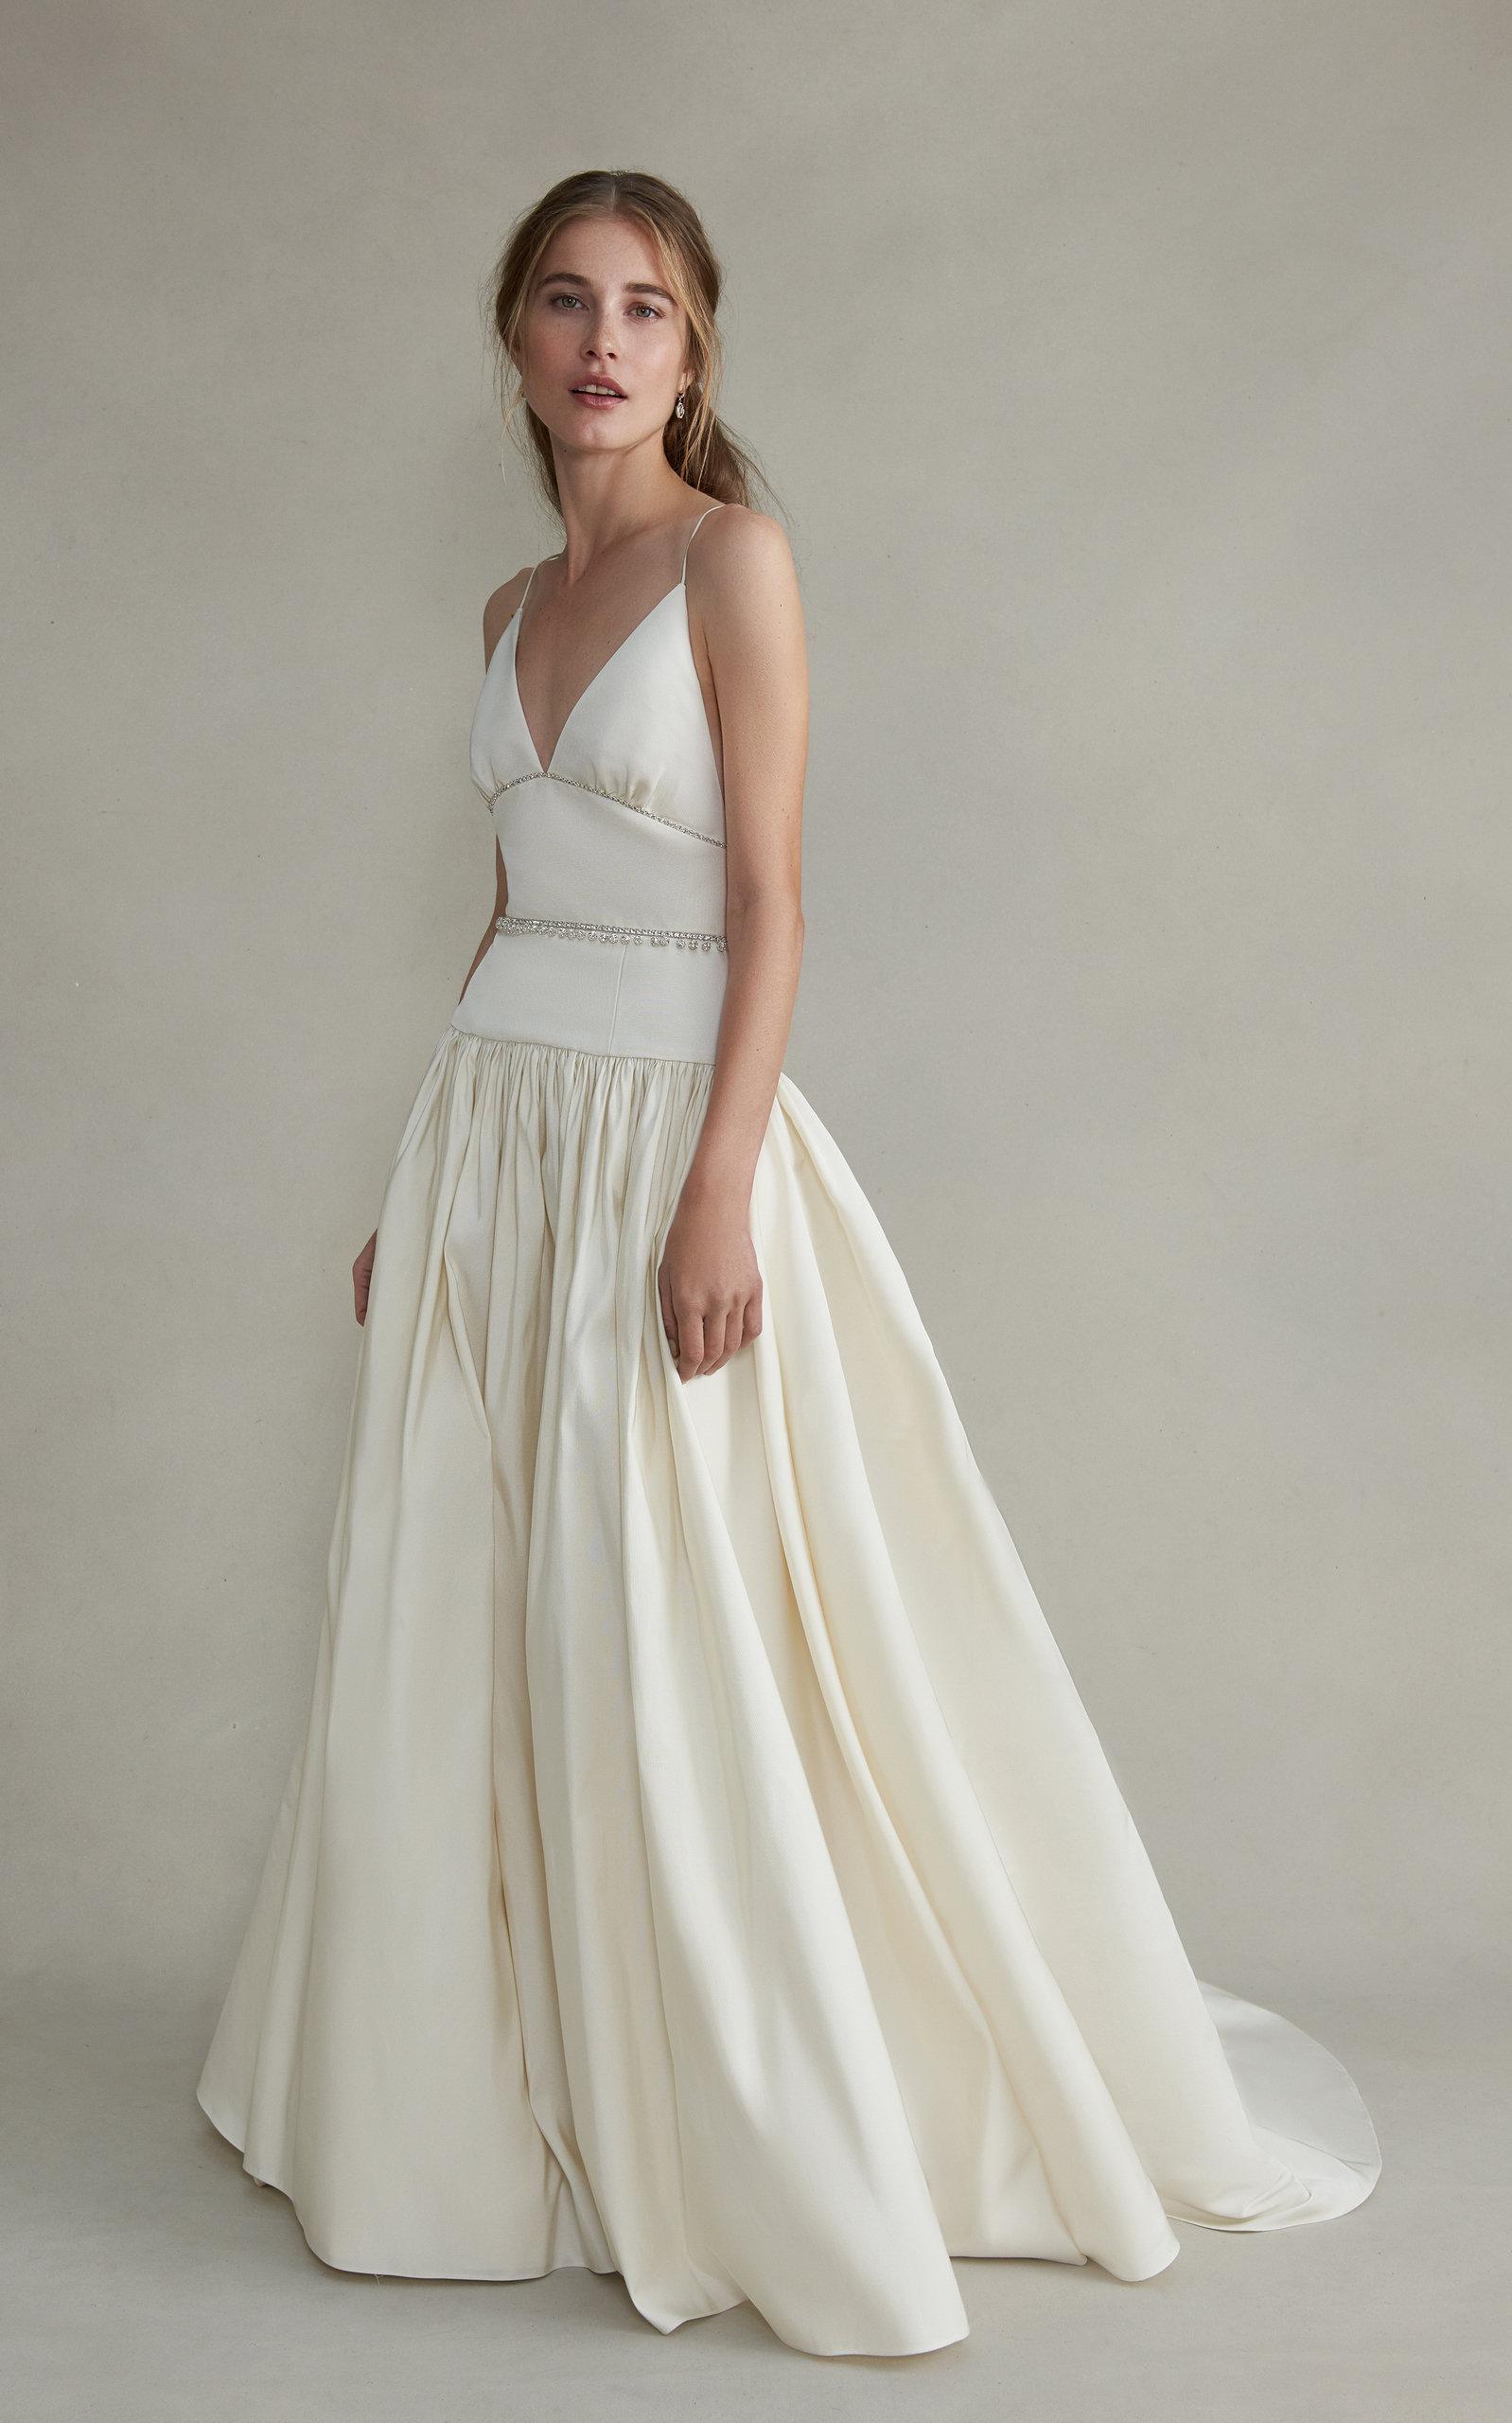 MARKARIAN Jasmine V-Neck Jeweled Silk Gathered Gown in White